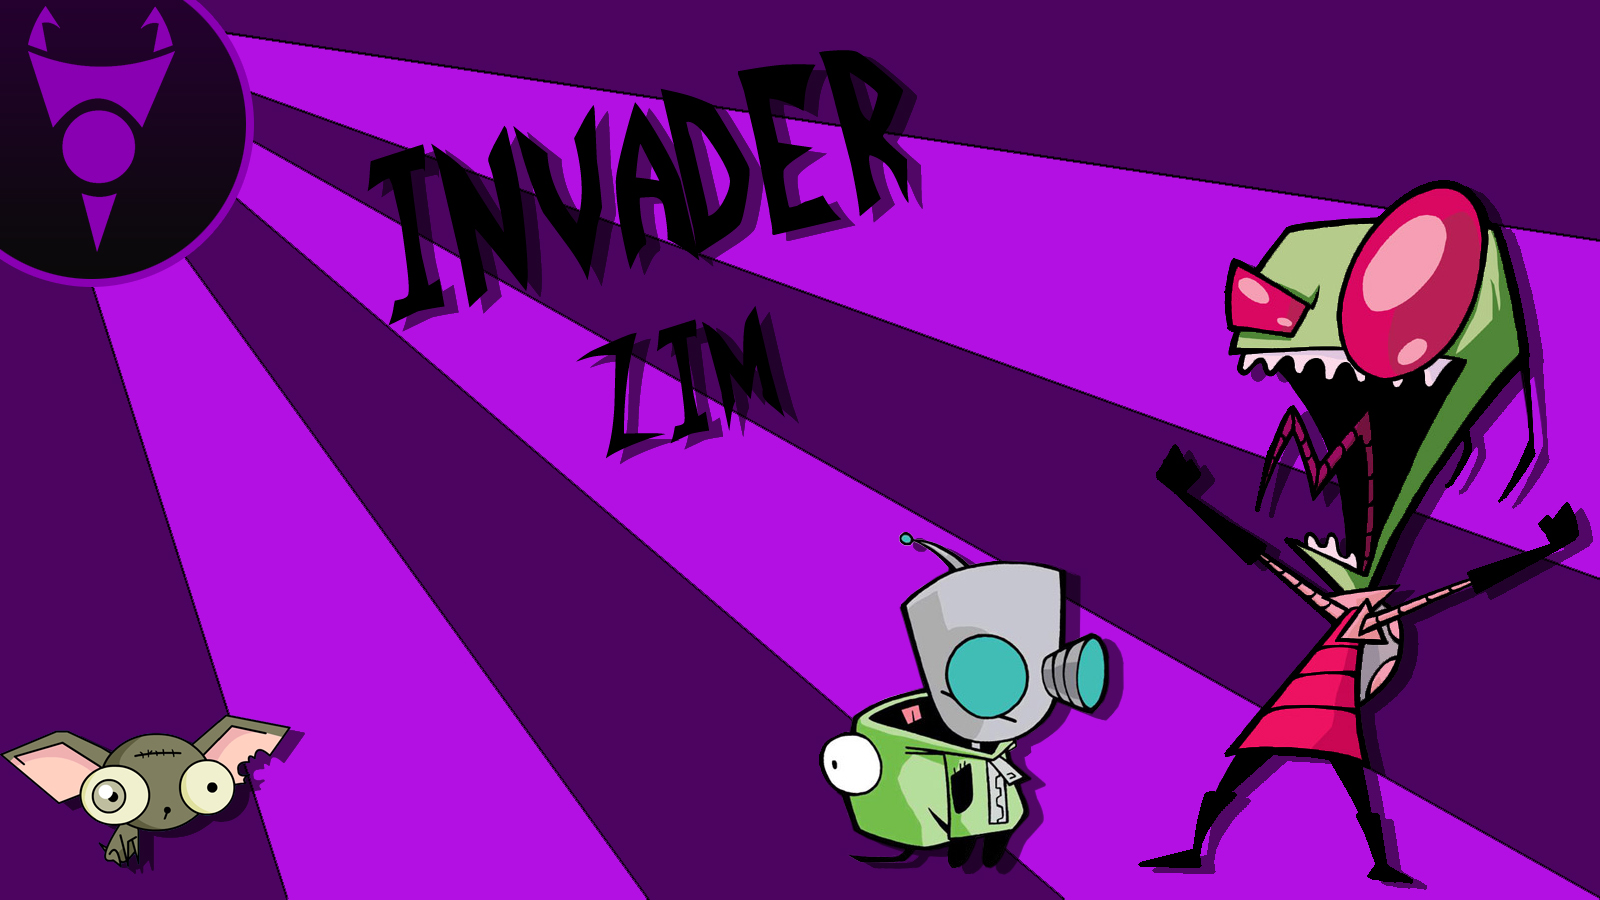 Invader Zim Background - WallpaperSafari